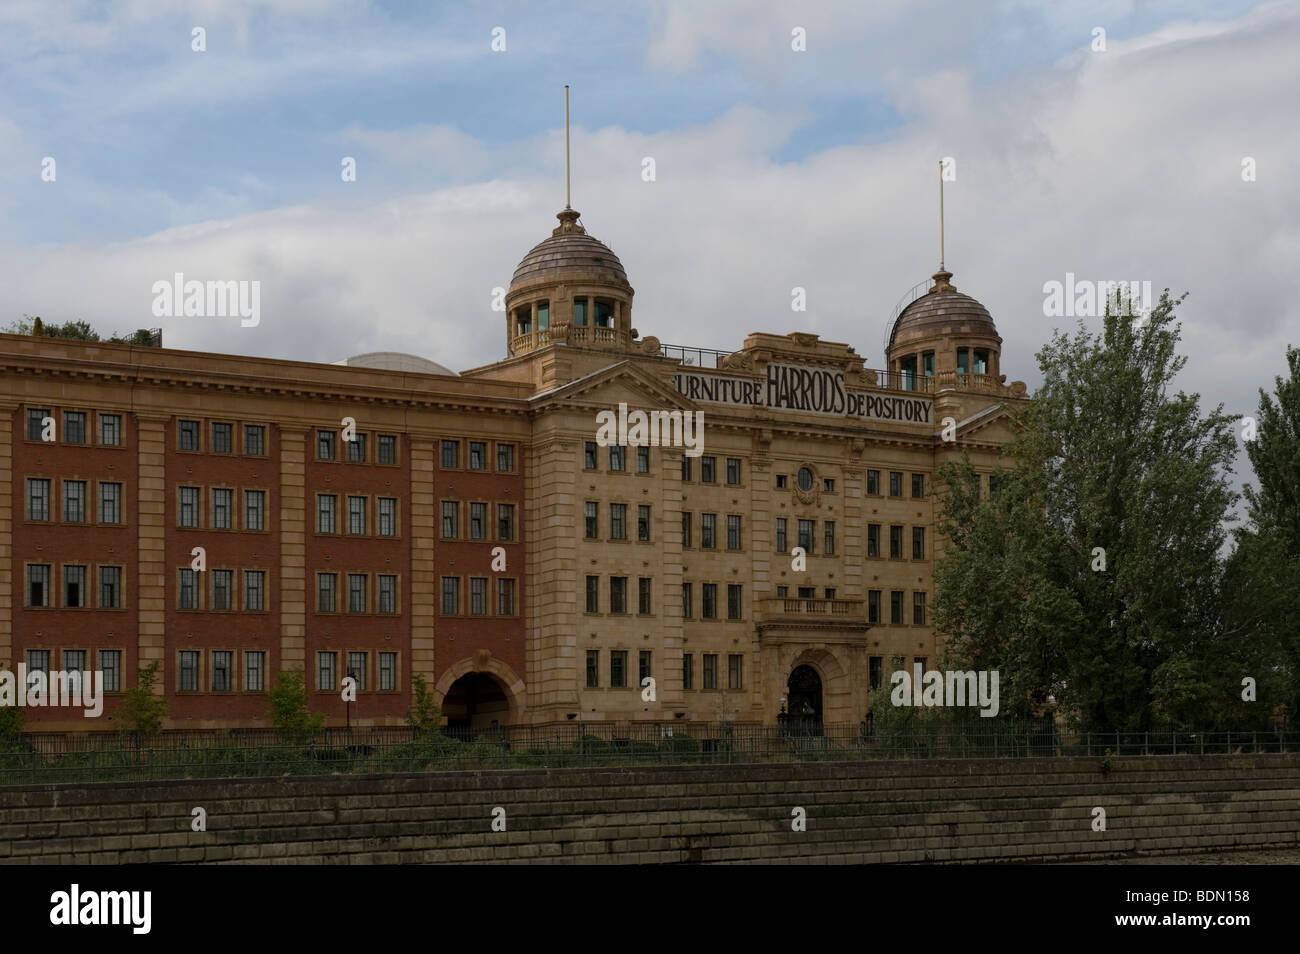 Harrods Depository Village Redevelopment Barnes - Stock Image